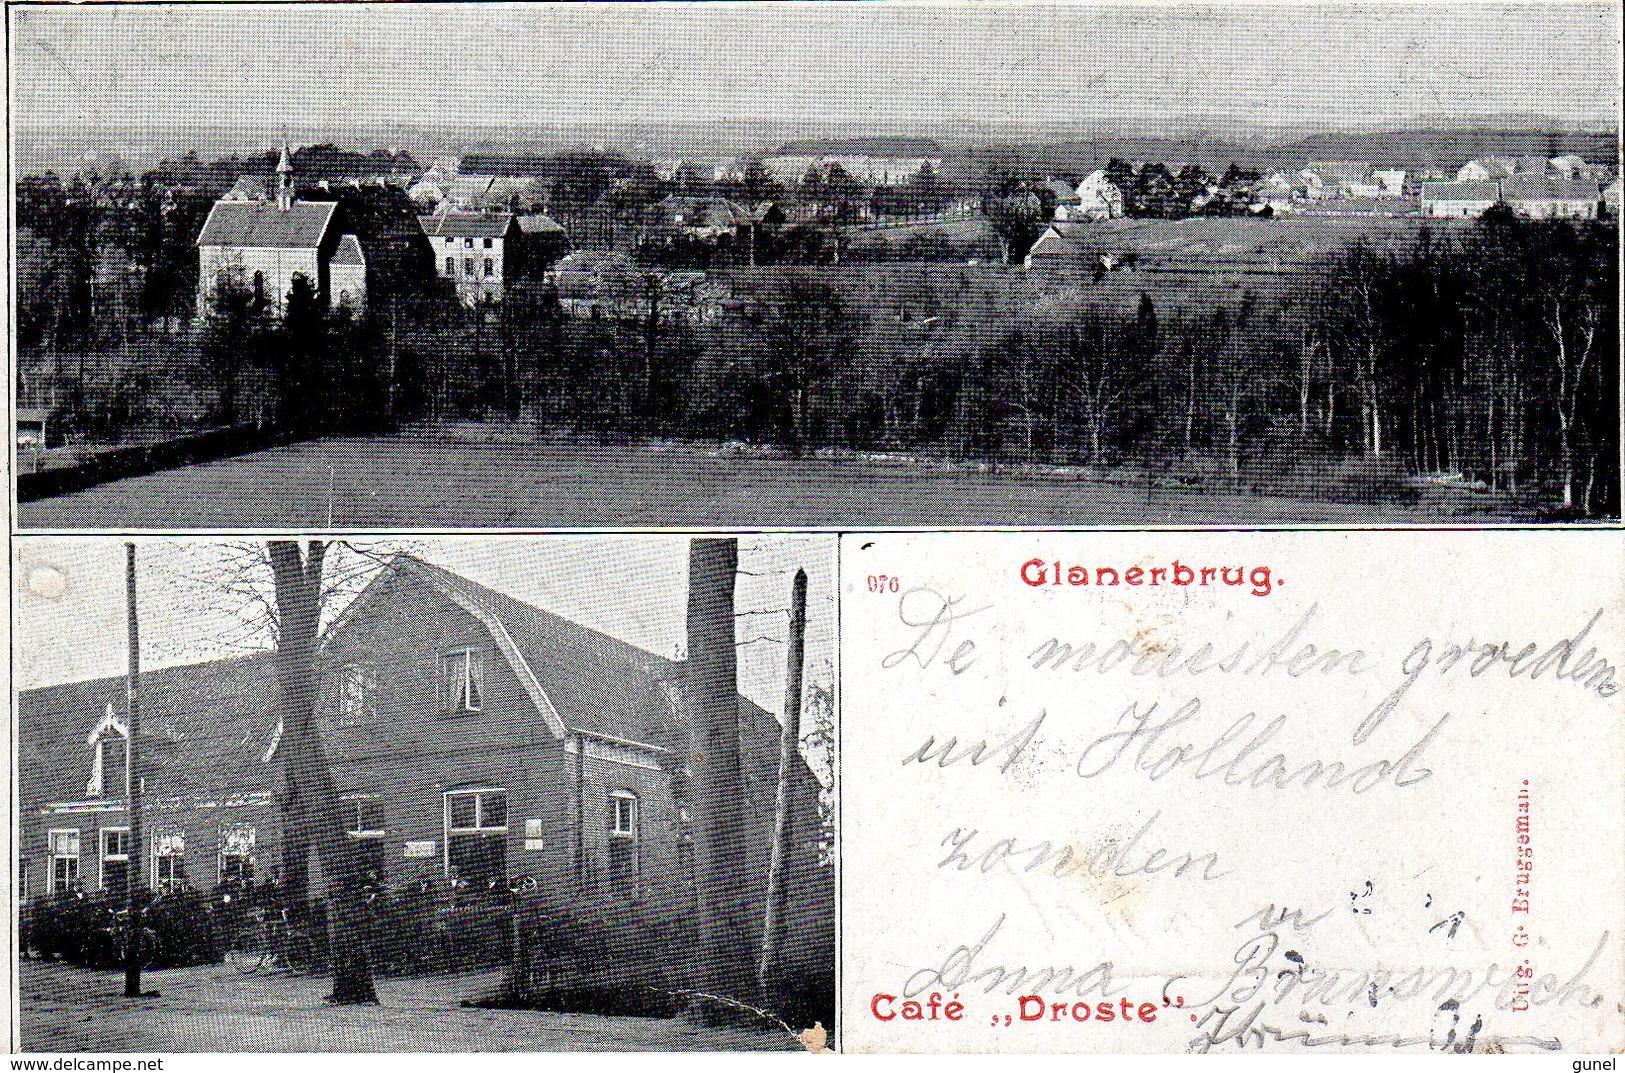 8 JUL 01 Grootrond GLANERBRUG Op Ansicht Naar Bremen - Postal History